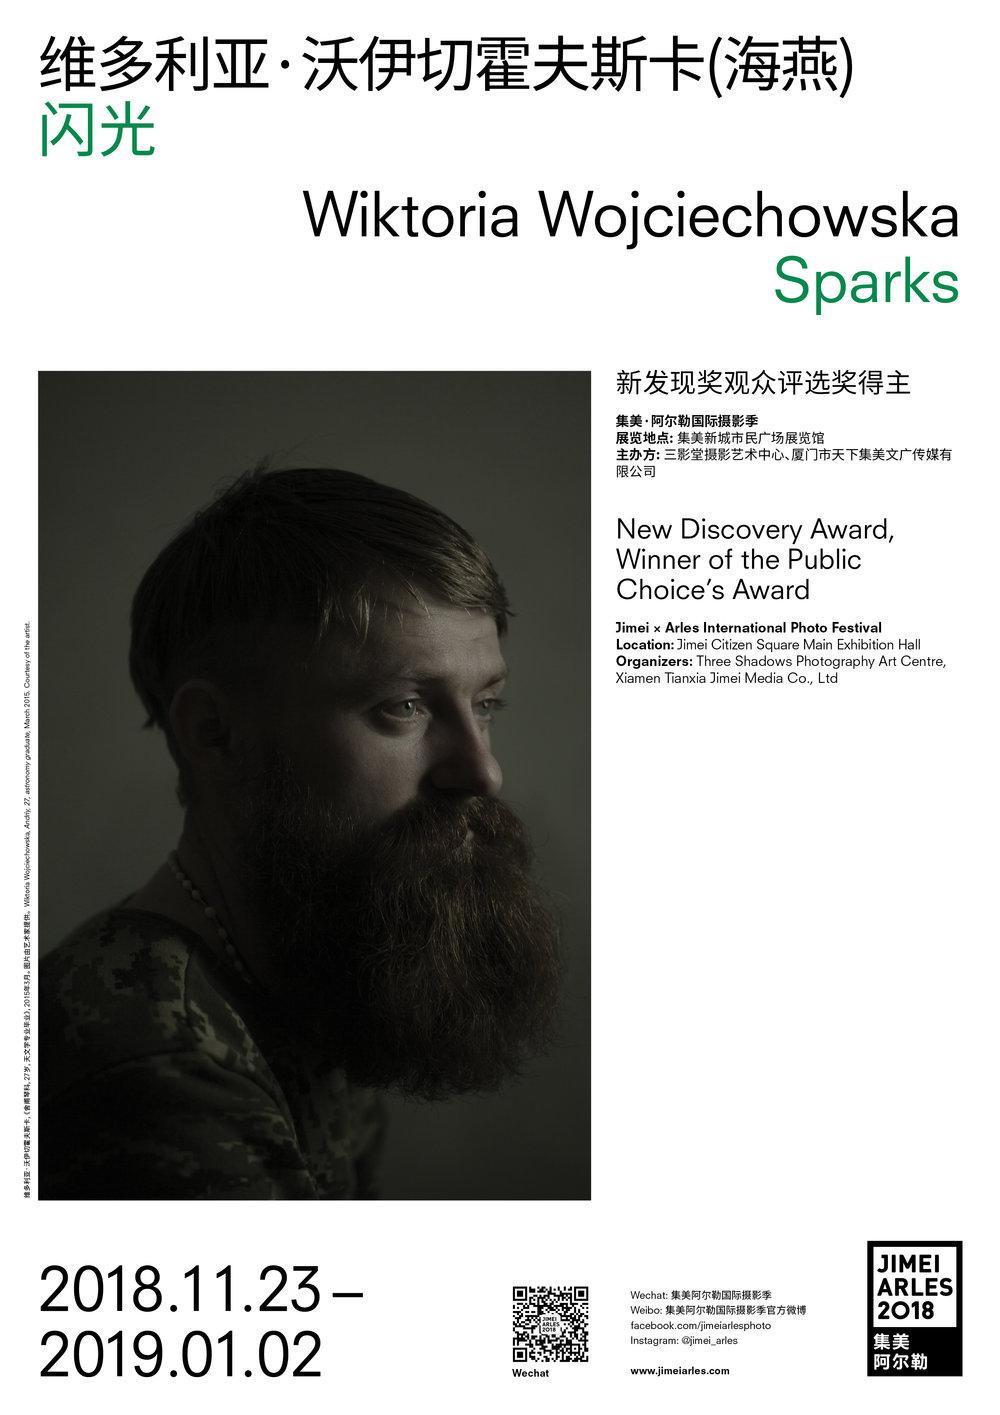 JIMEIARLES_exhibition poster_Digital_Wiktoria_Wojciechowska.jpg